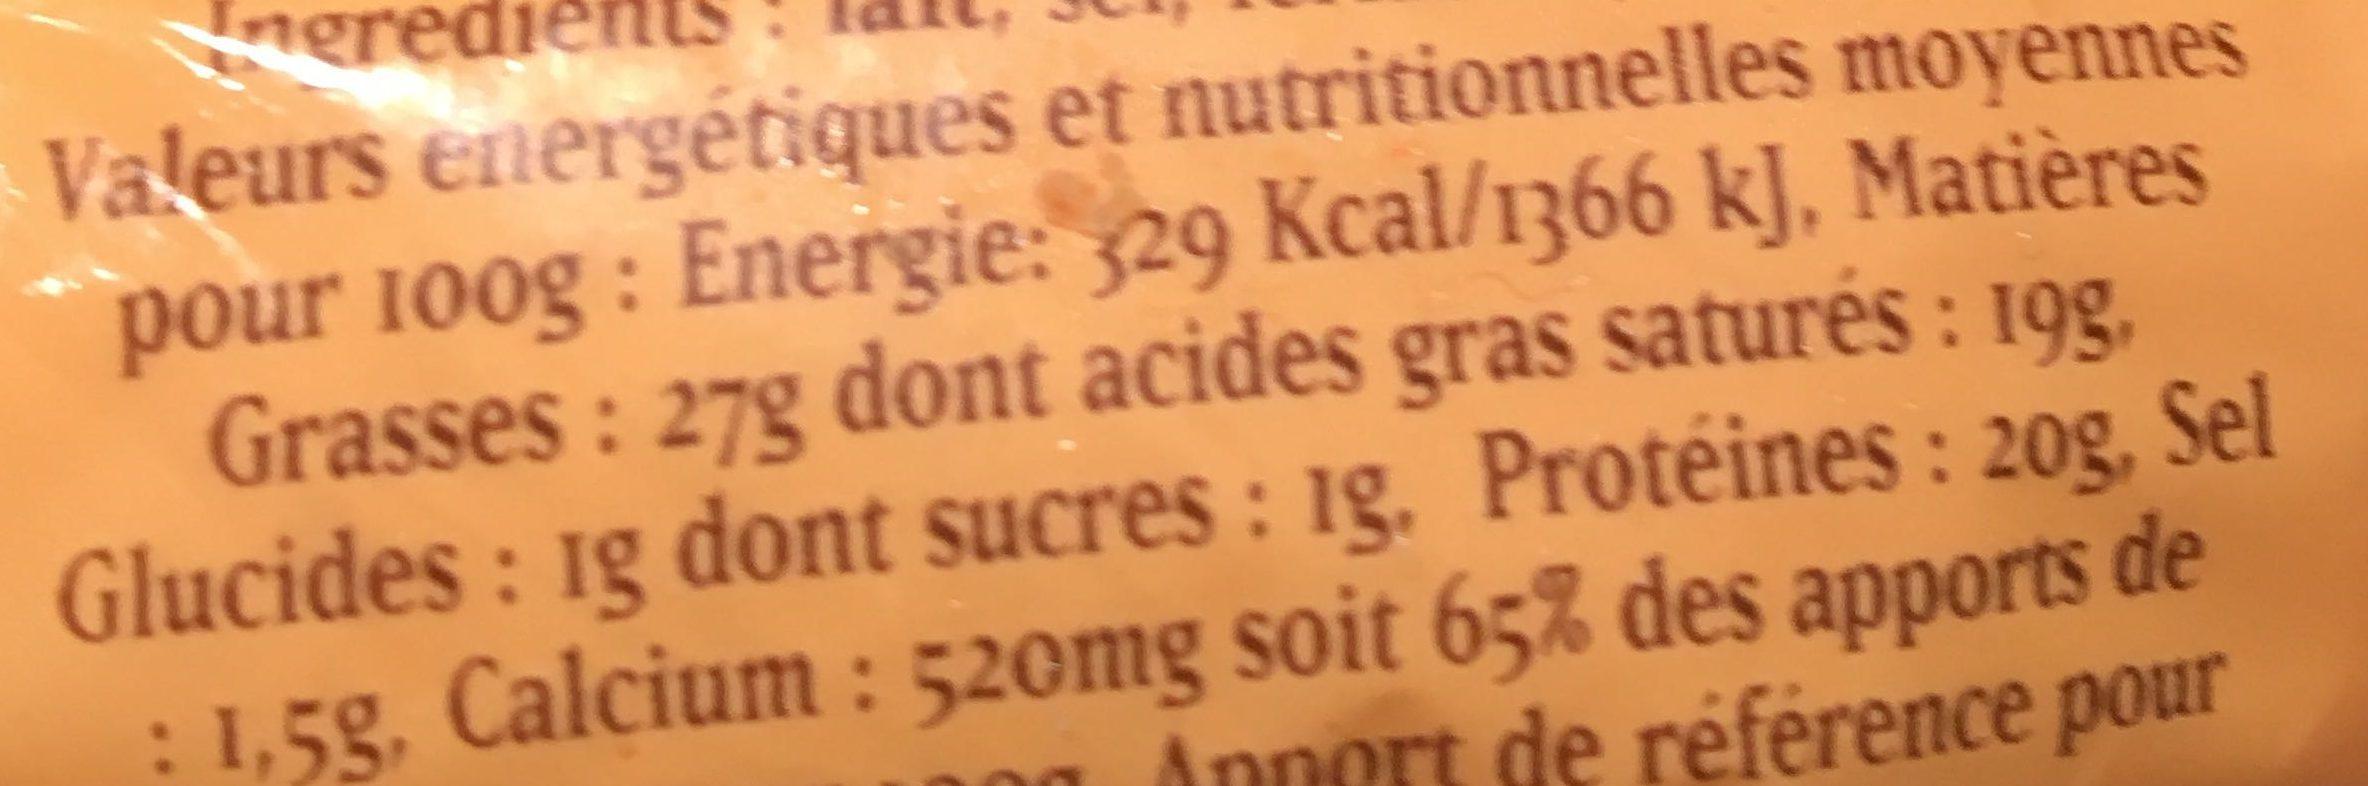 Fromage pour tartiflette - Informations nutritionnelles - fr